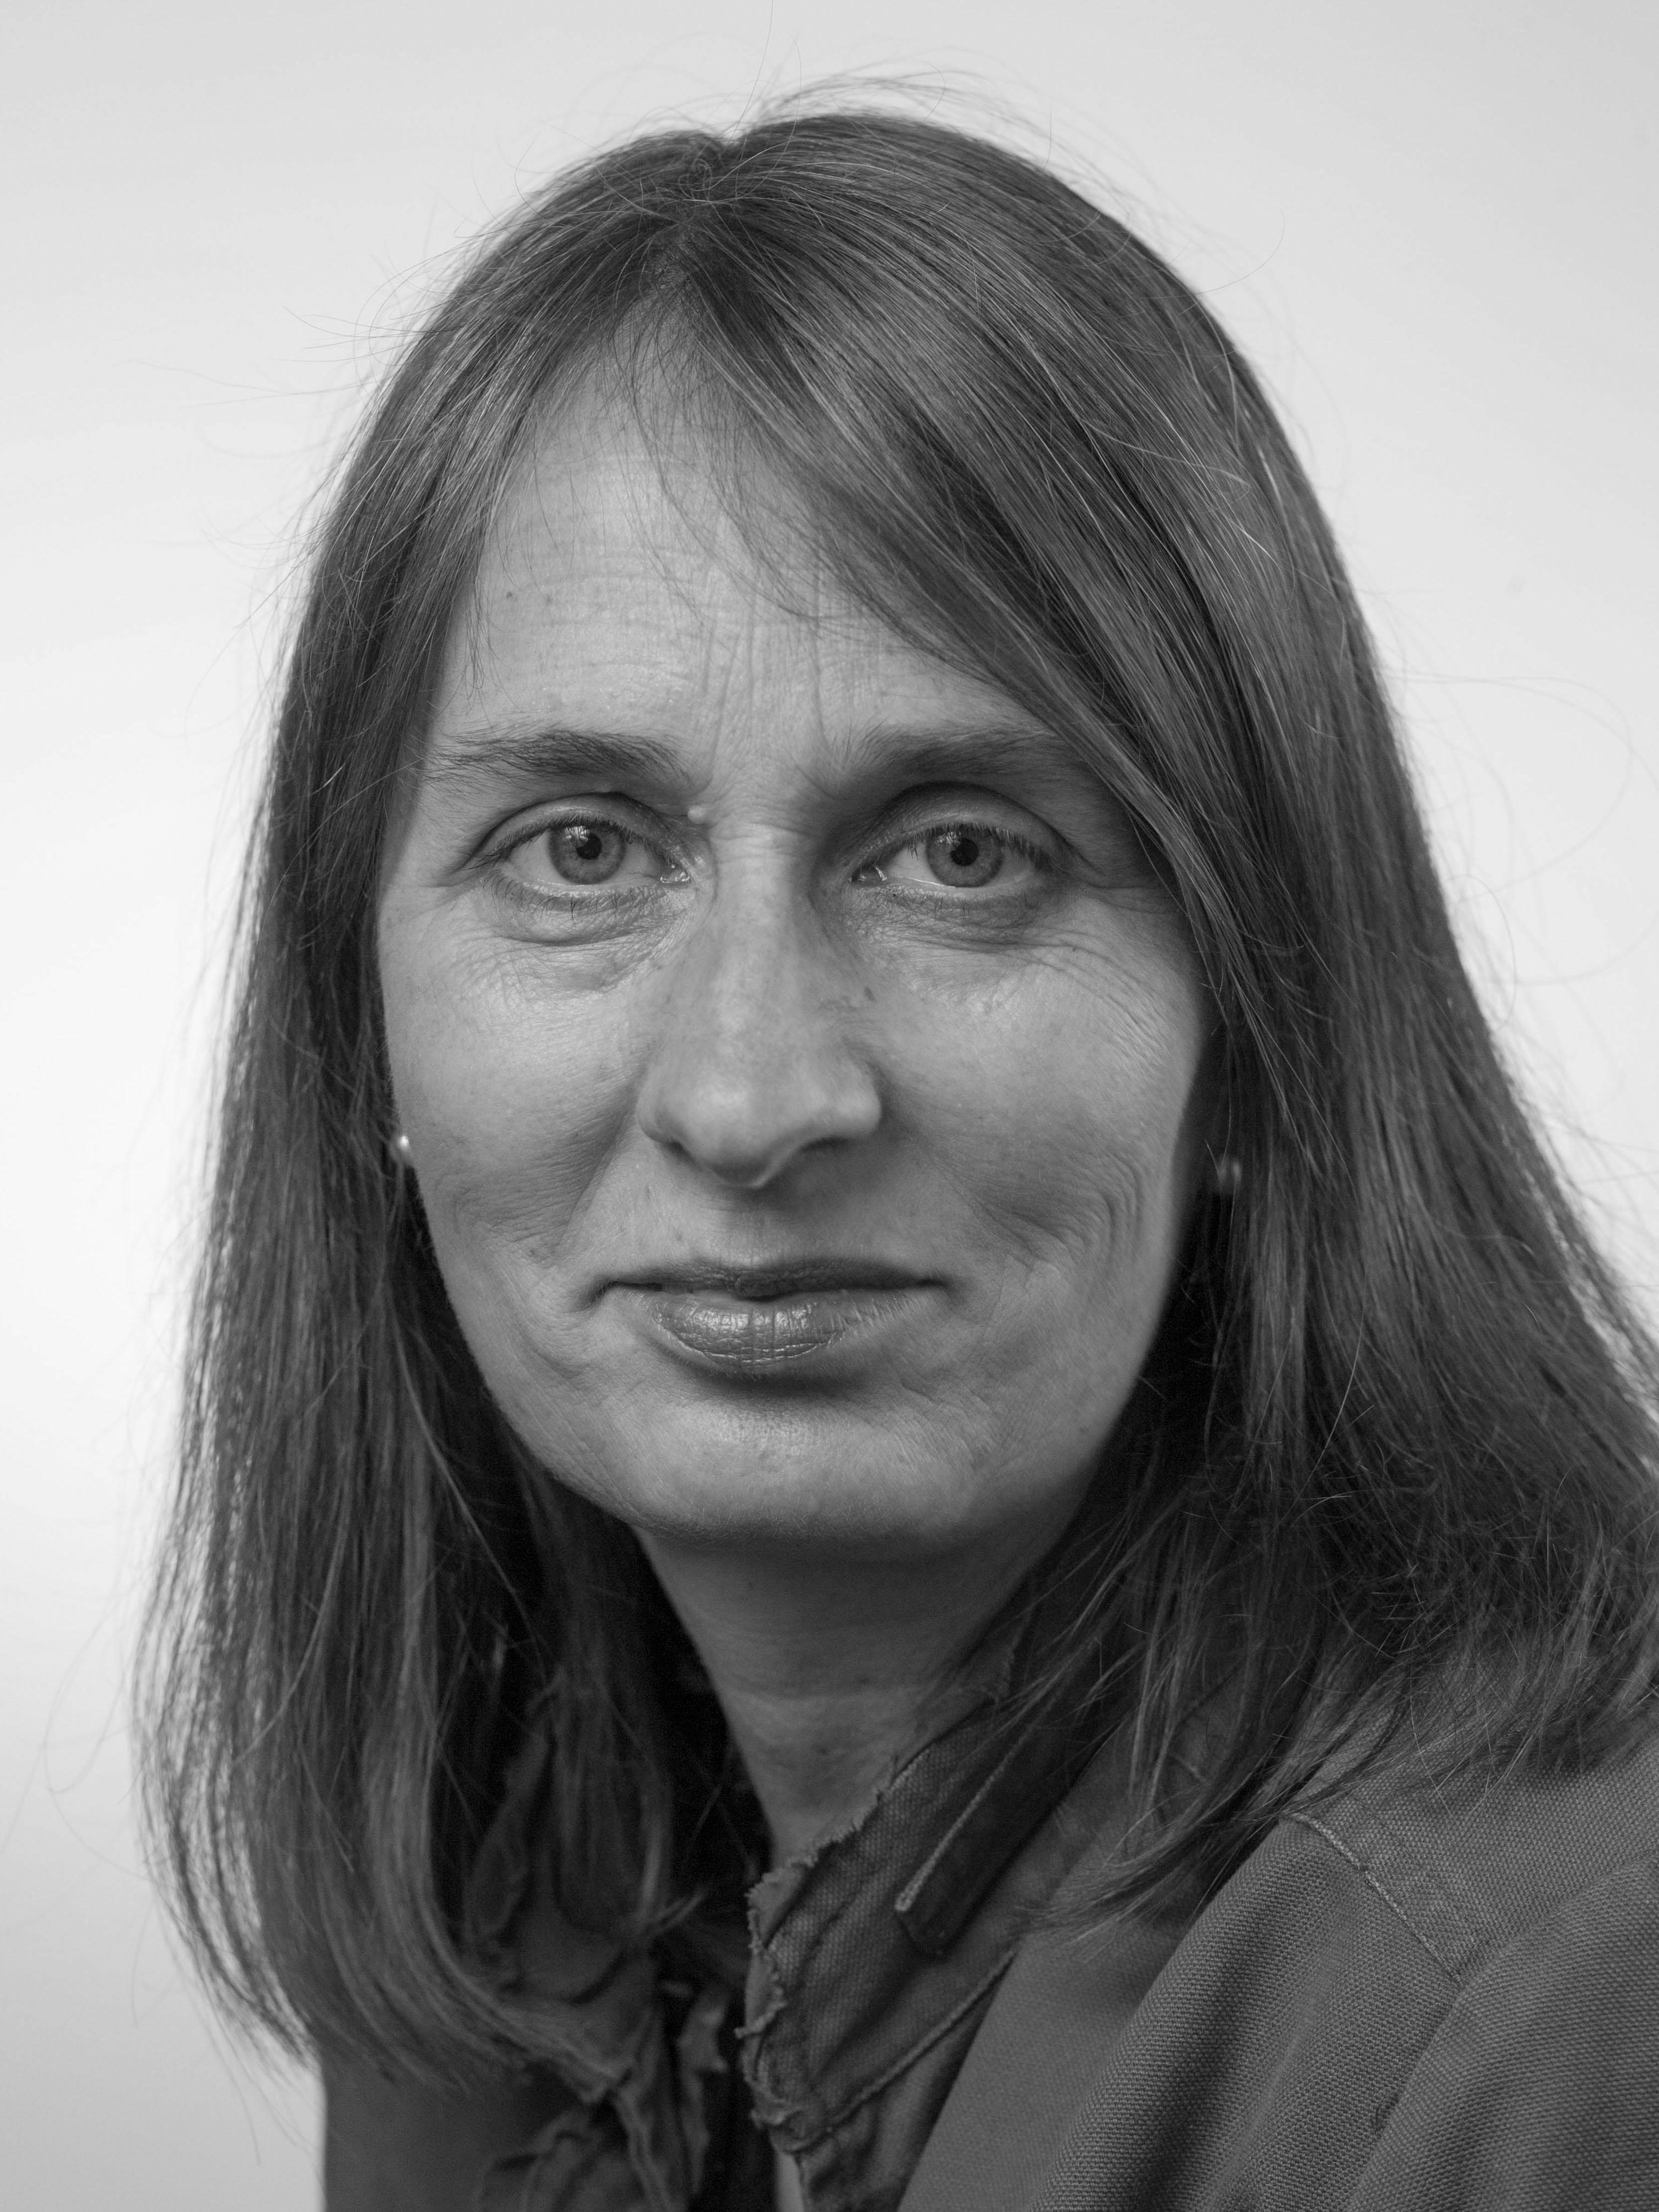 Bettina Krusat-Barnickel